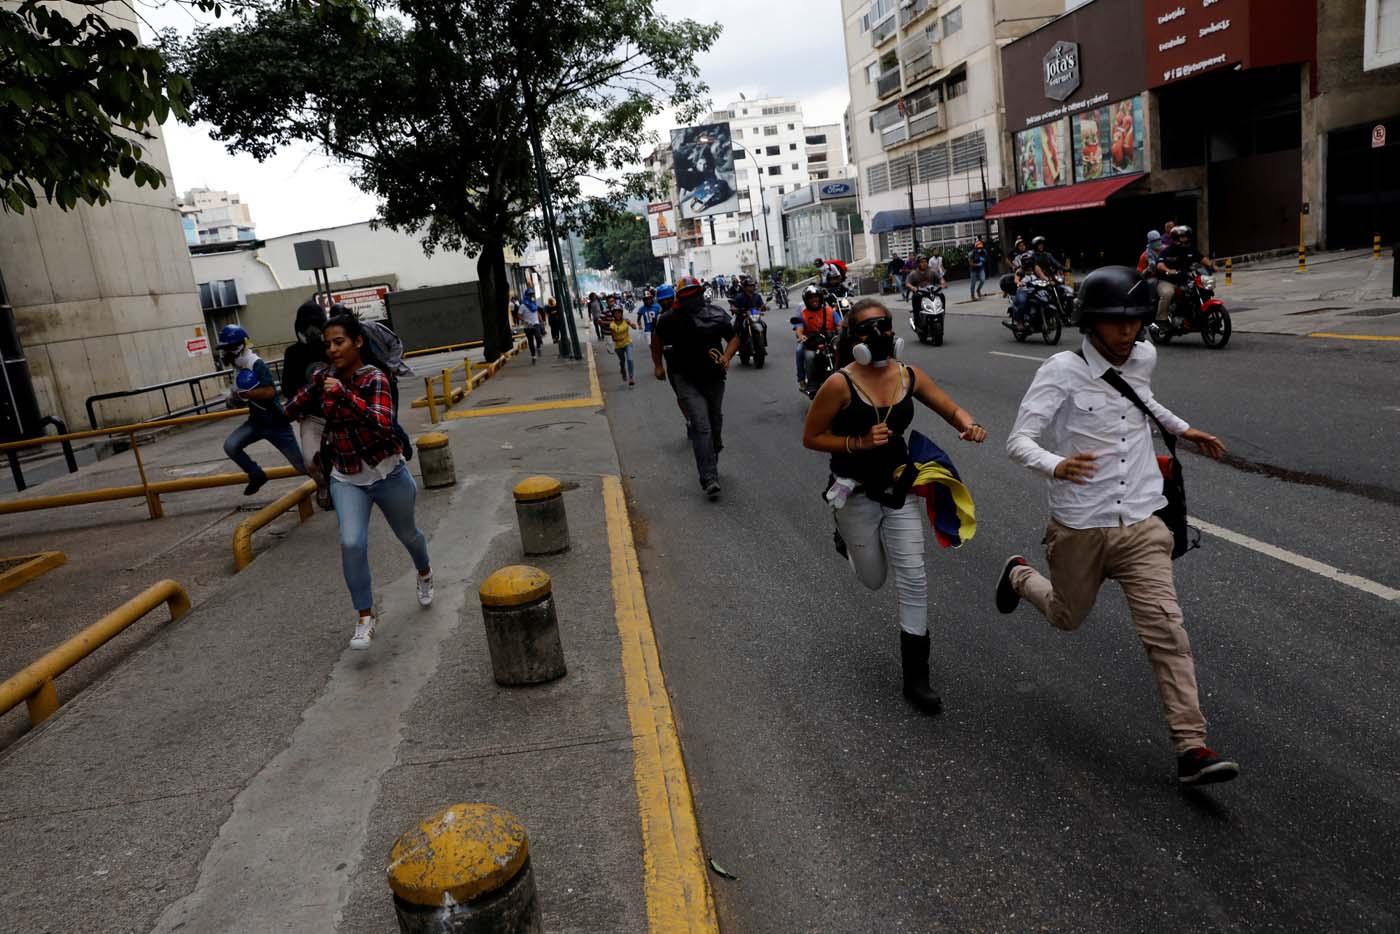 Opposition supporters run away while rallying against Venezuelan President Nicolas Maduro in Caracas, Venezuela, May 8, 2017. REUTERS/Carlos Garcia Rawlins